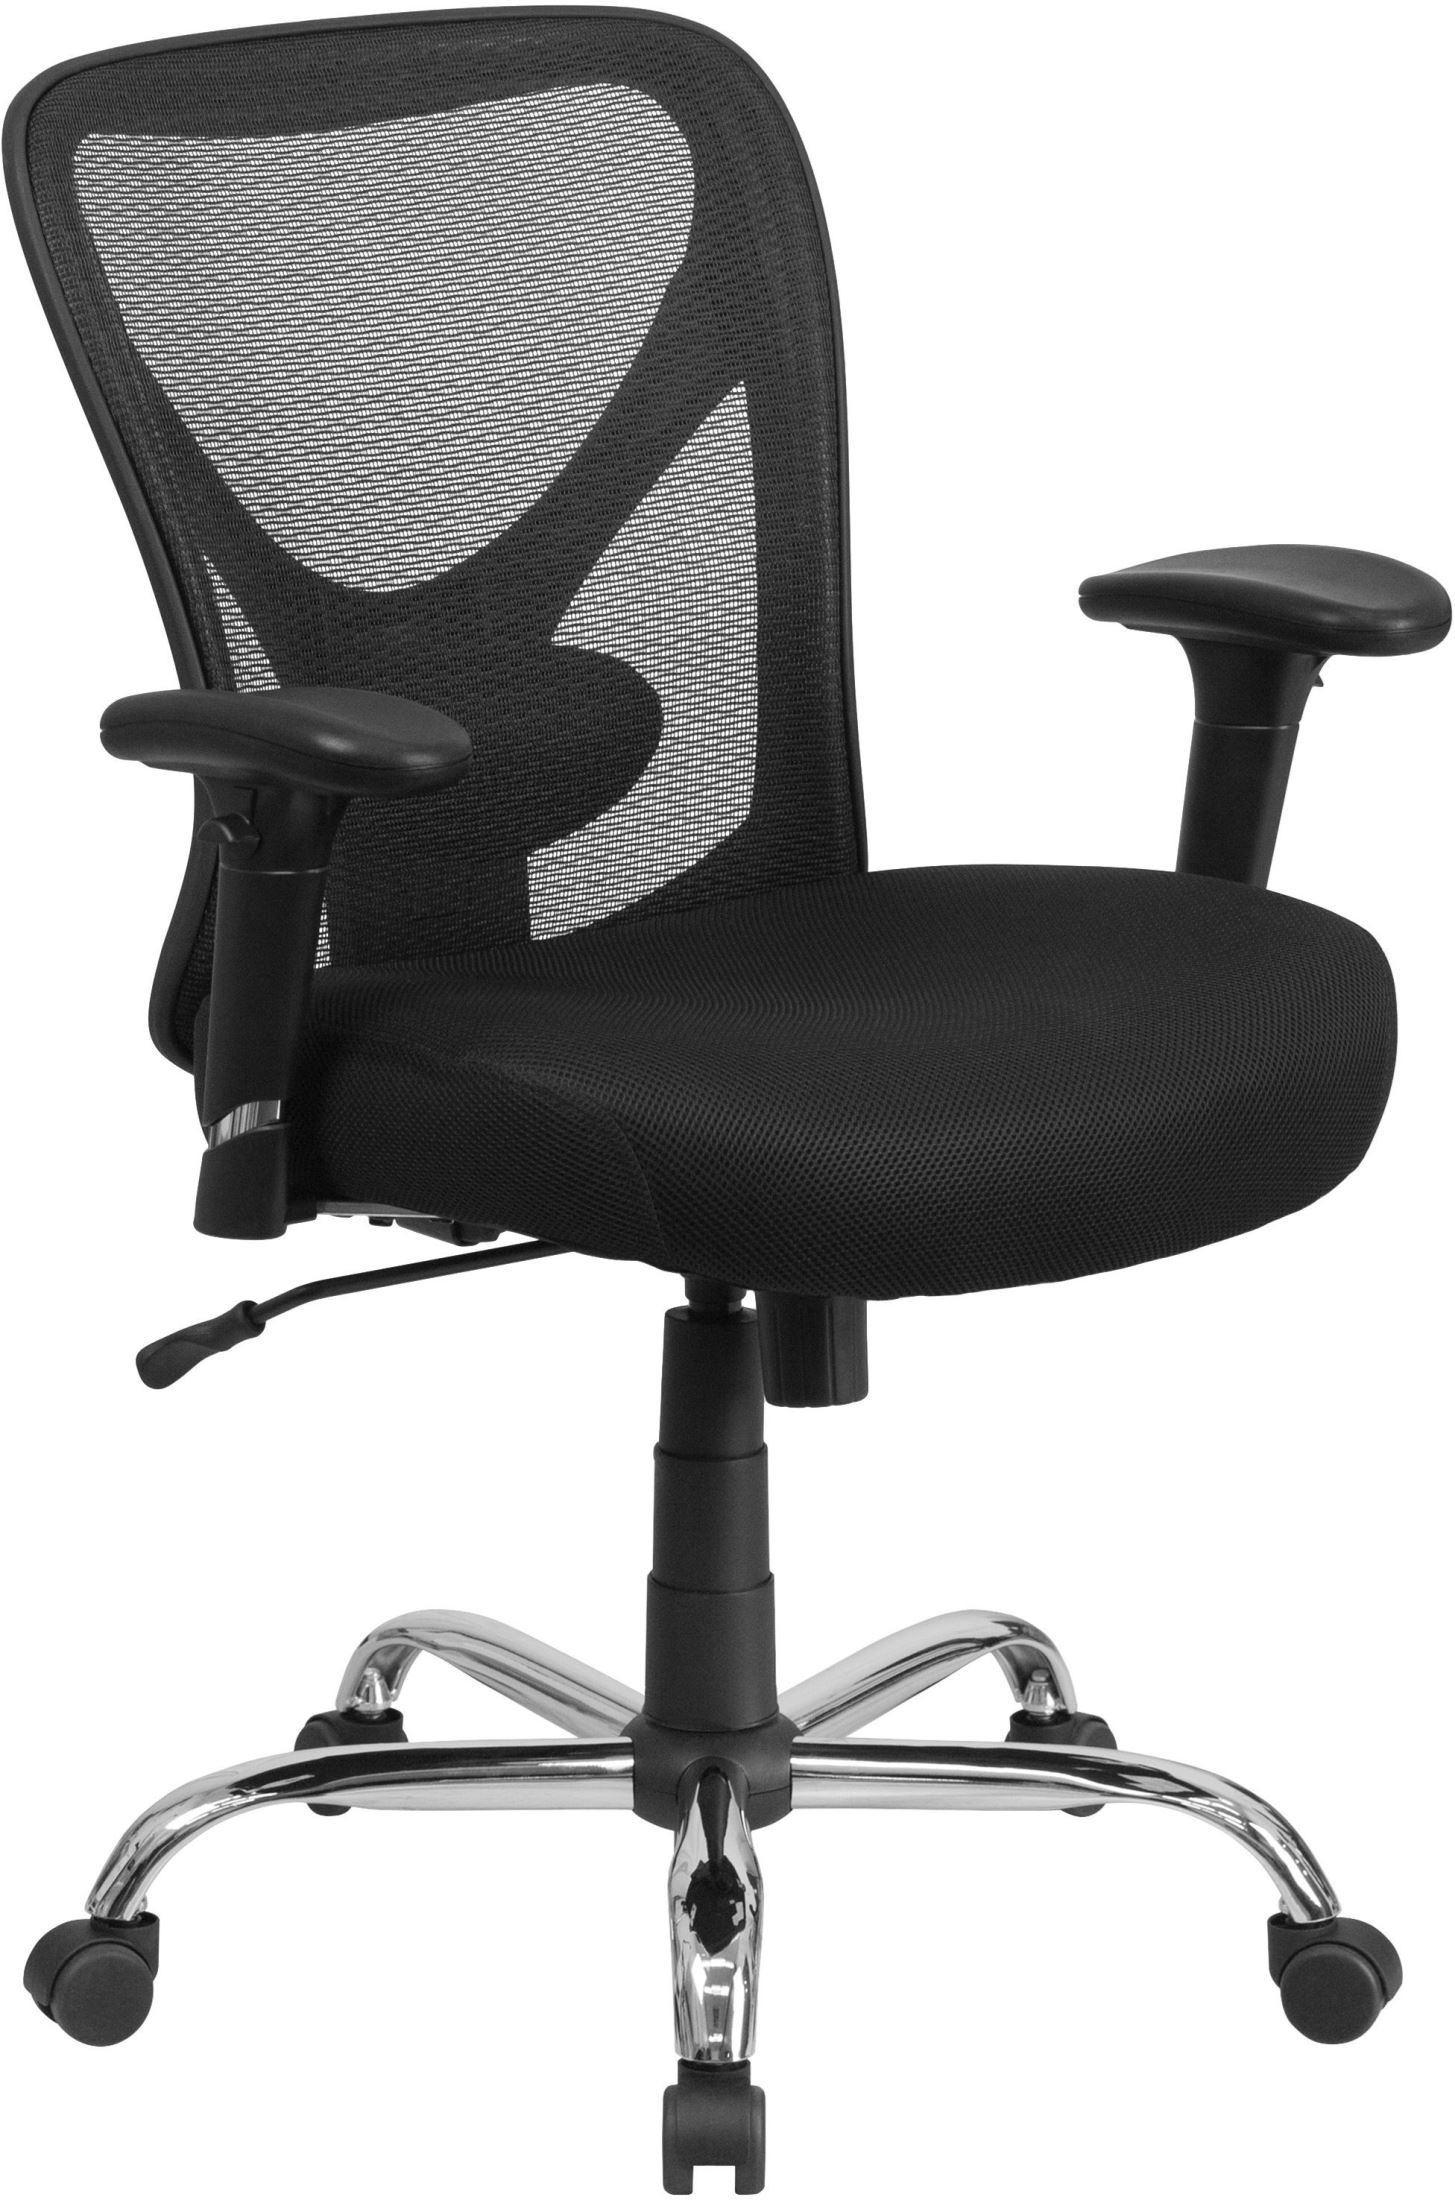 HERCULES Big  Tall Black Swivel Task Chair from Renegade